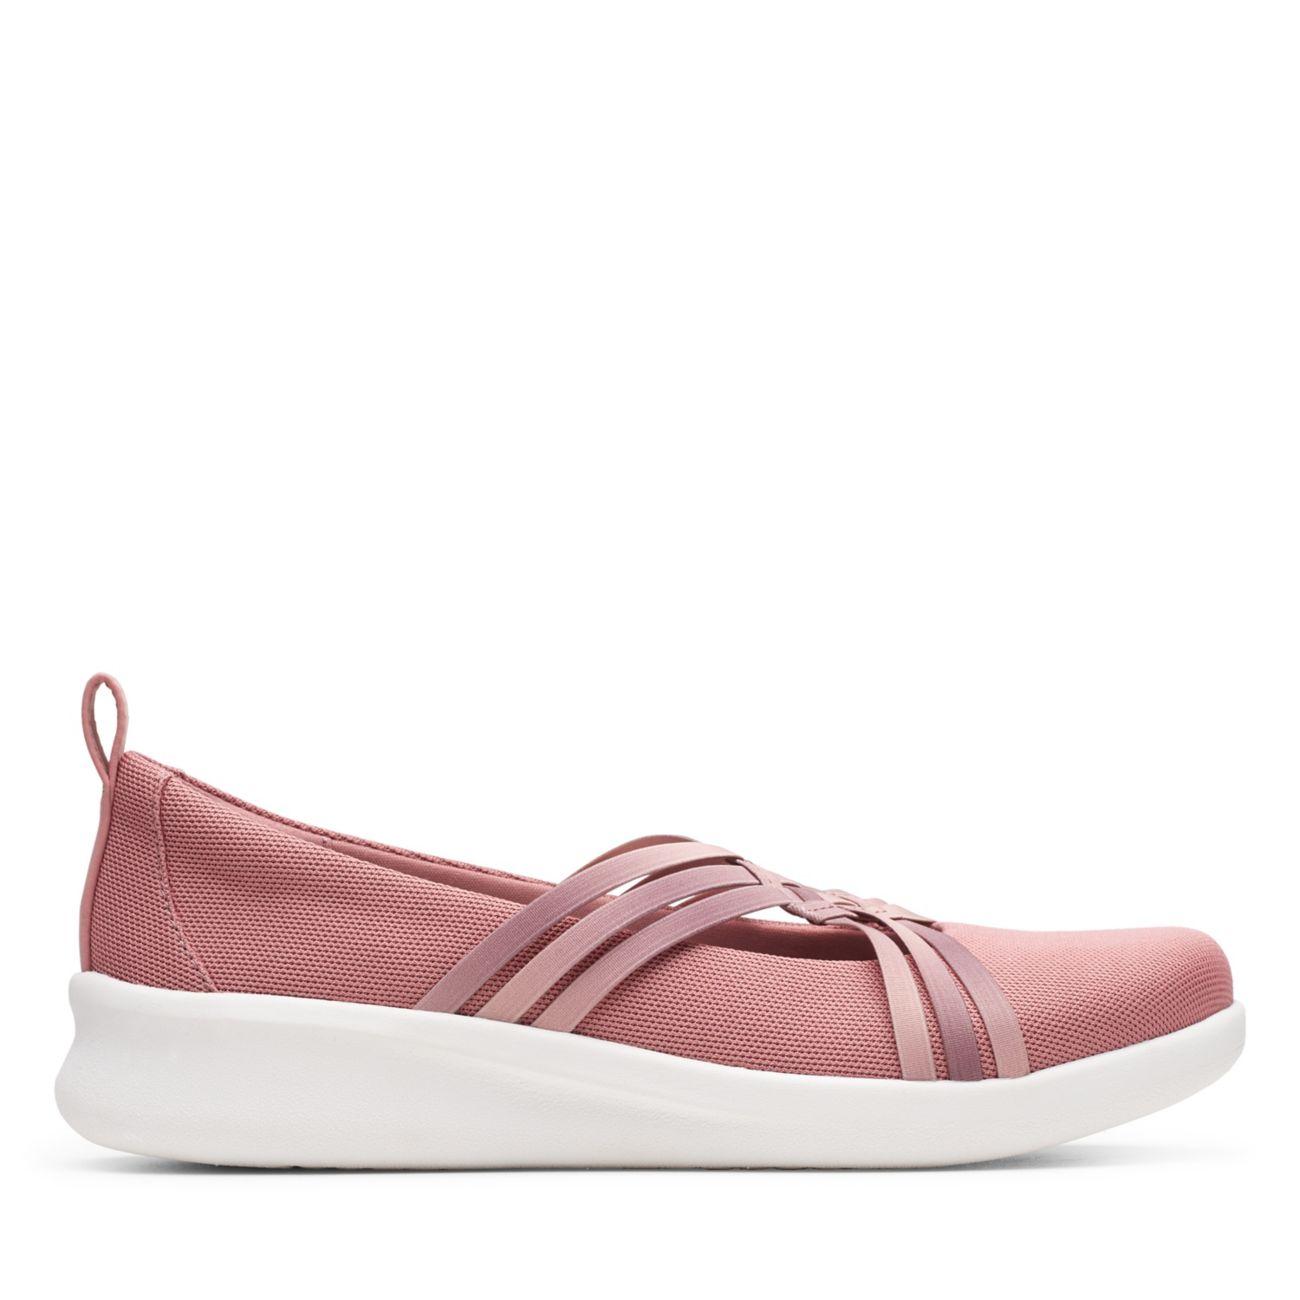 Sillian2.0 Cora Mauve-Womens Slip Ons-Clarks® Shoes Official Site   | Clarks